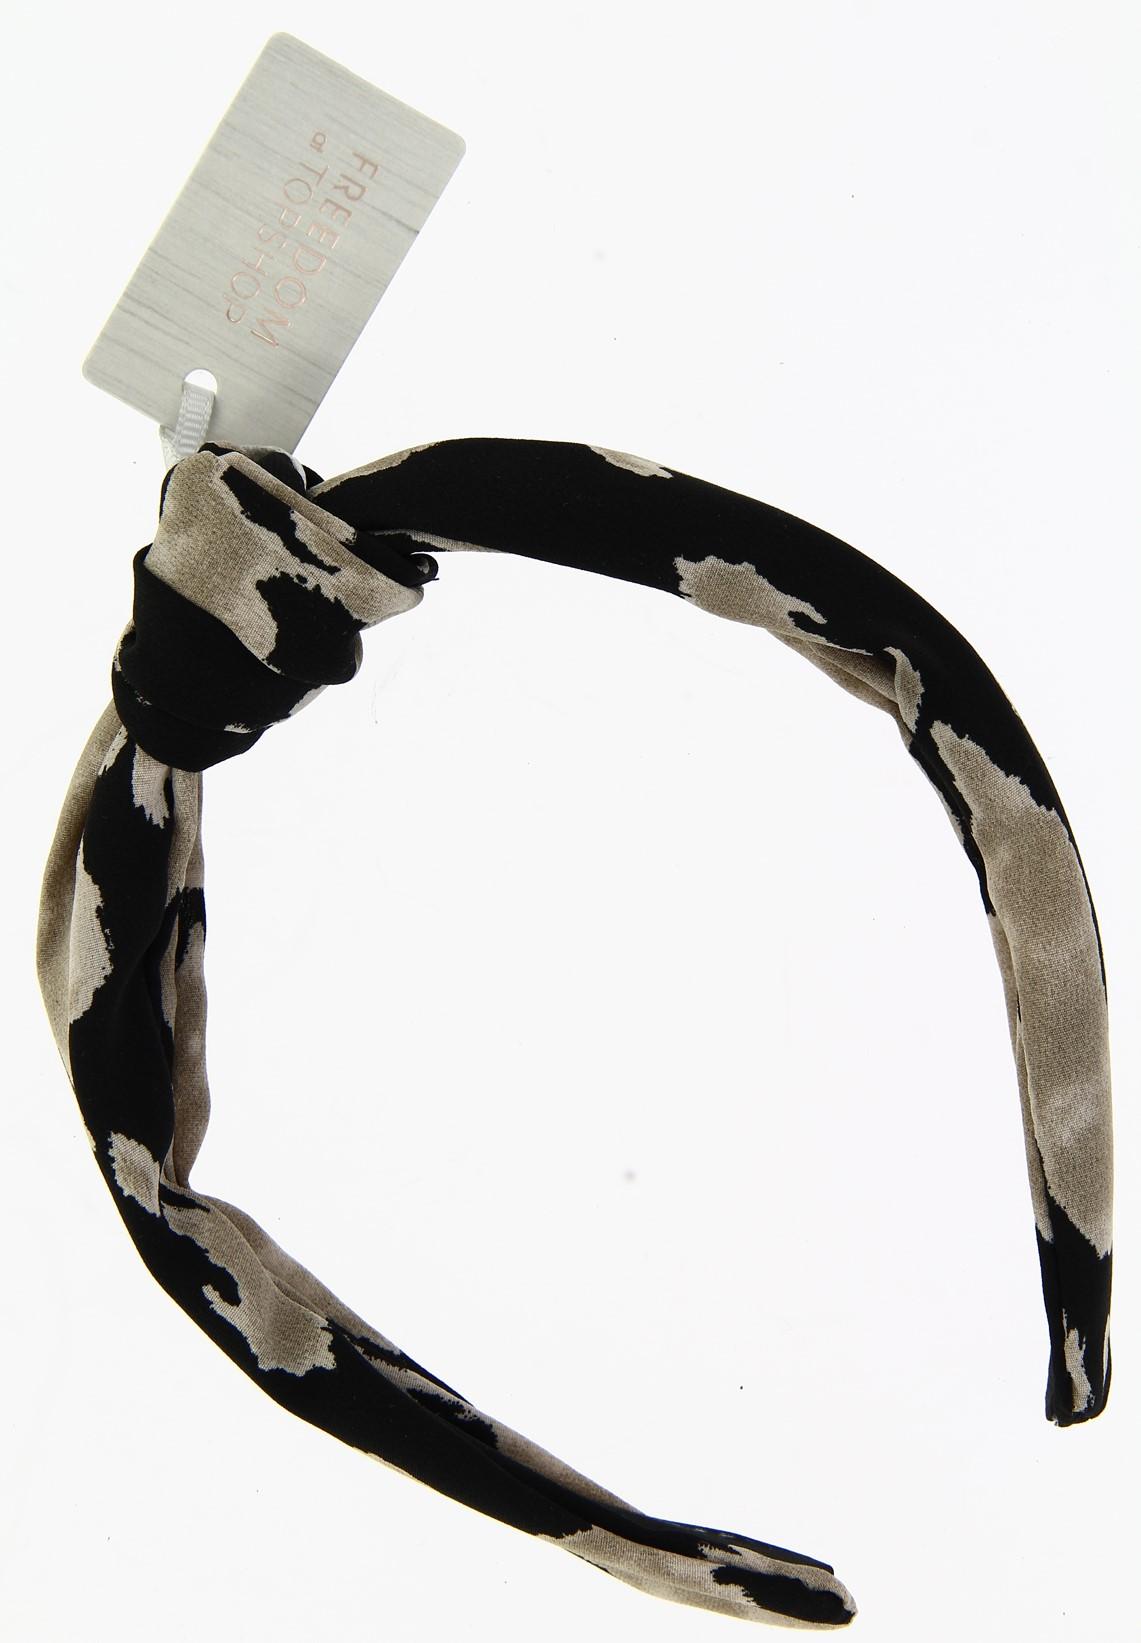 100 x Freedom at TOPSHOP stylish headband   UK SELLER  